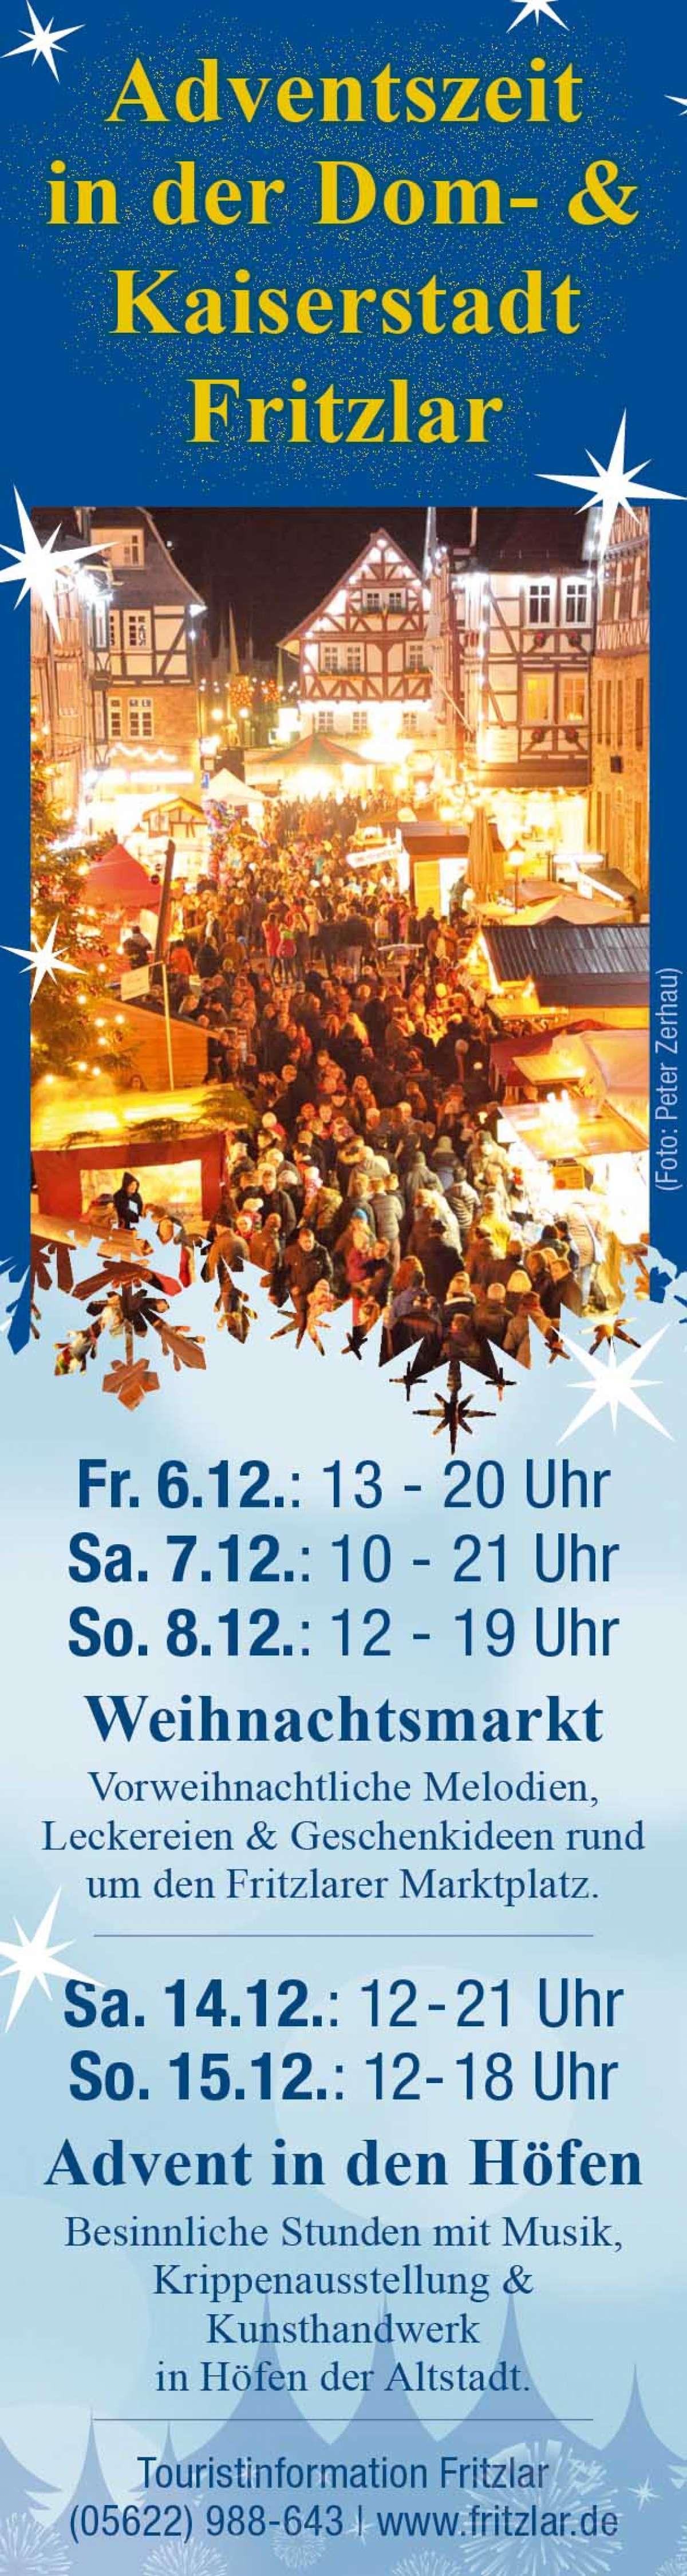 Advent in den Höfen - Altstadt  - Fritzlar